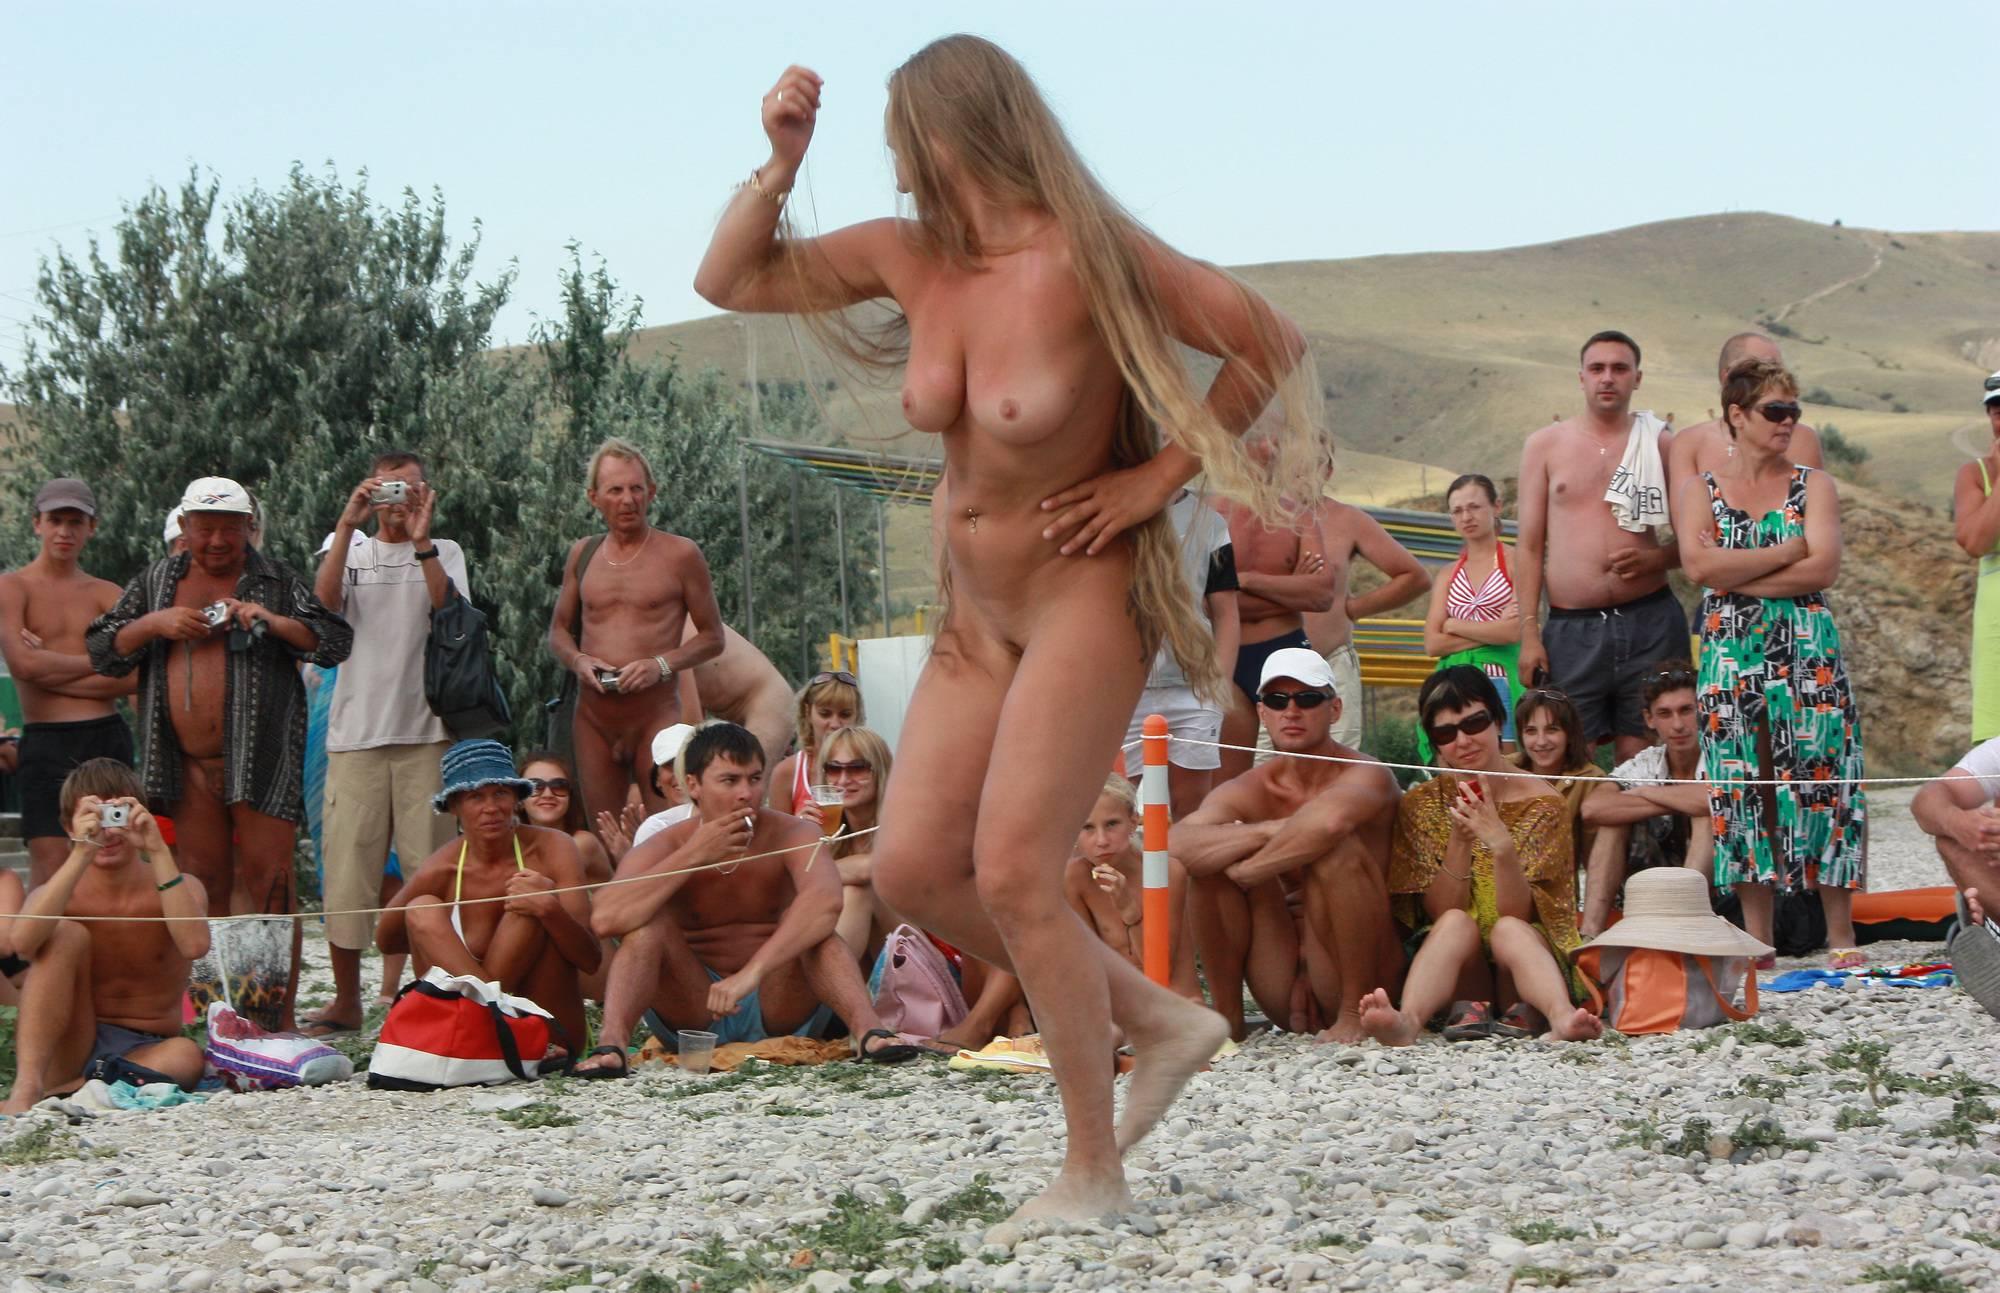 Purenudism Pics Neptune Woman Dance - 1